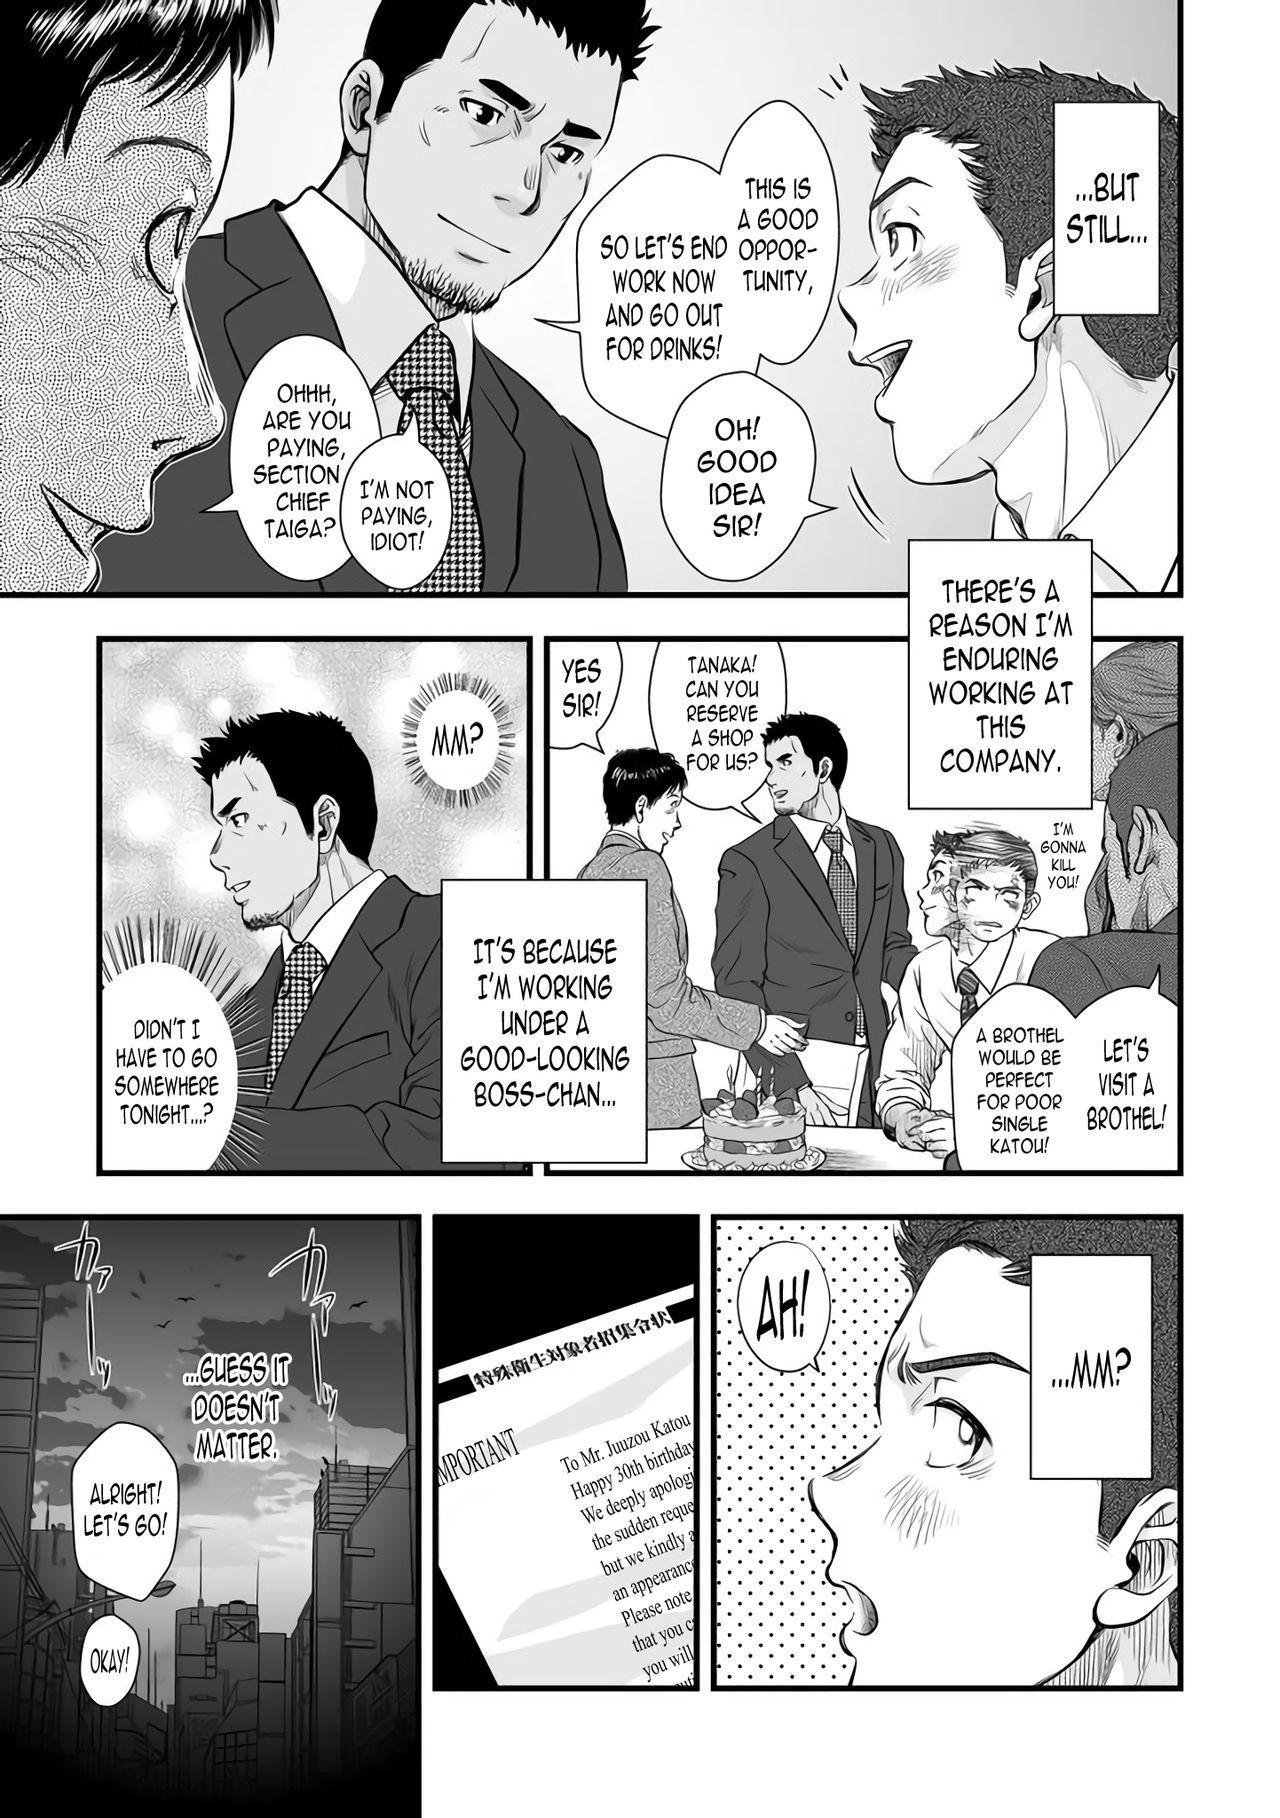 [Pagumiee (Kenta)] Tatakae!+++ (Plus-san)!! [English] [N04h] [Digital] 8